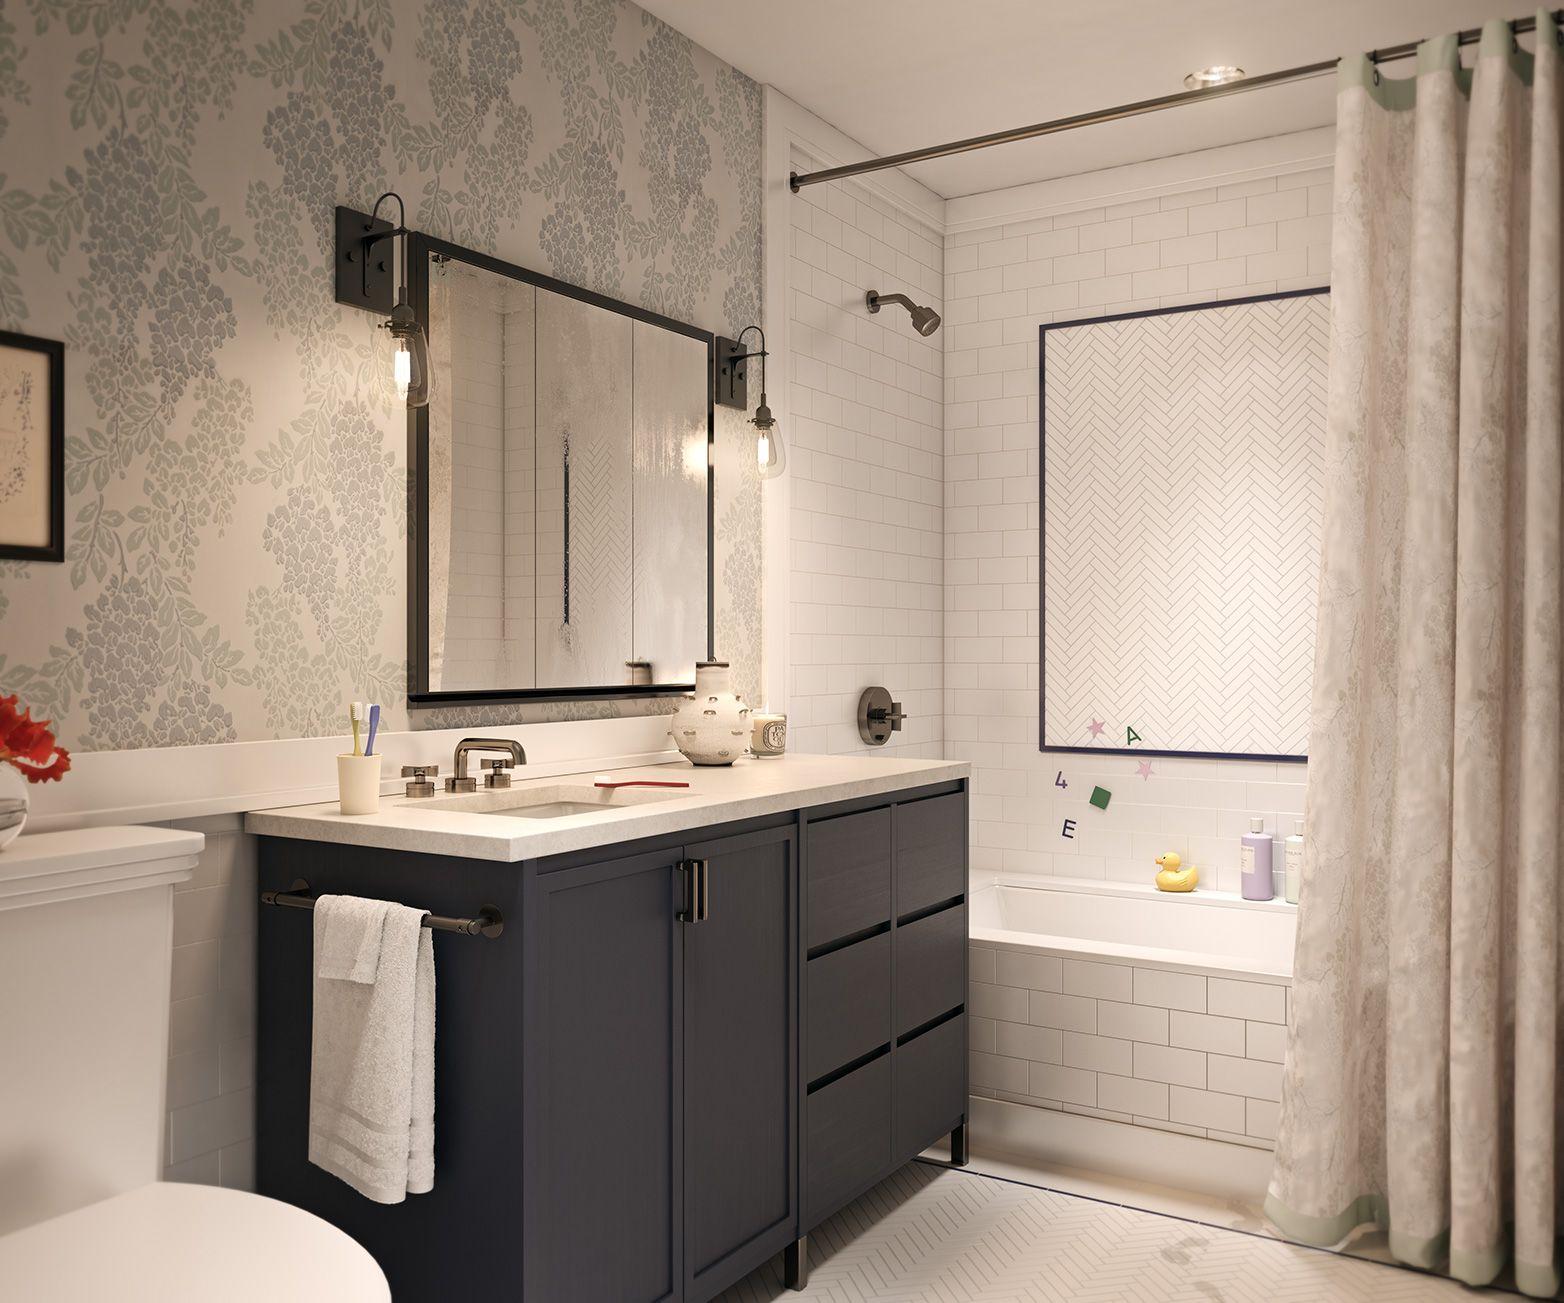 Navy And White Bathrooms Google Search Half Bathroom